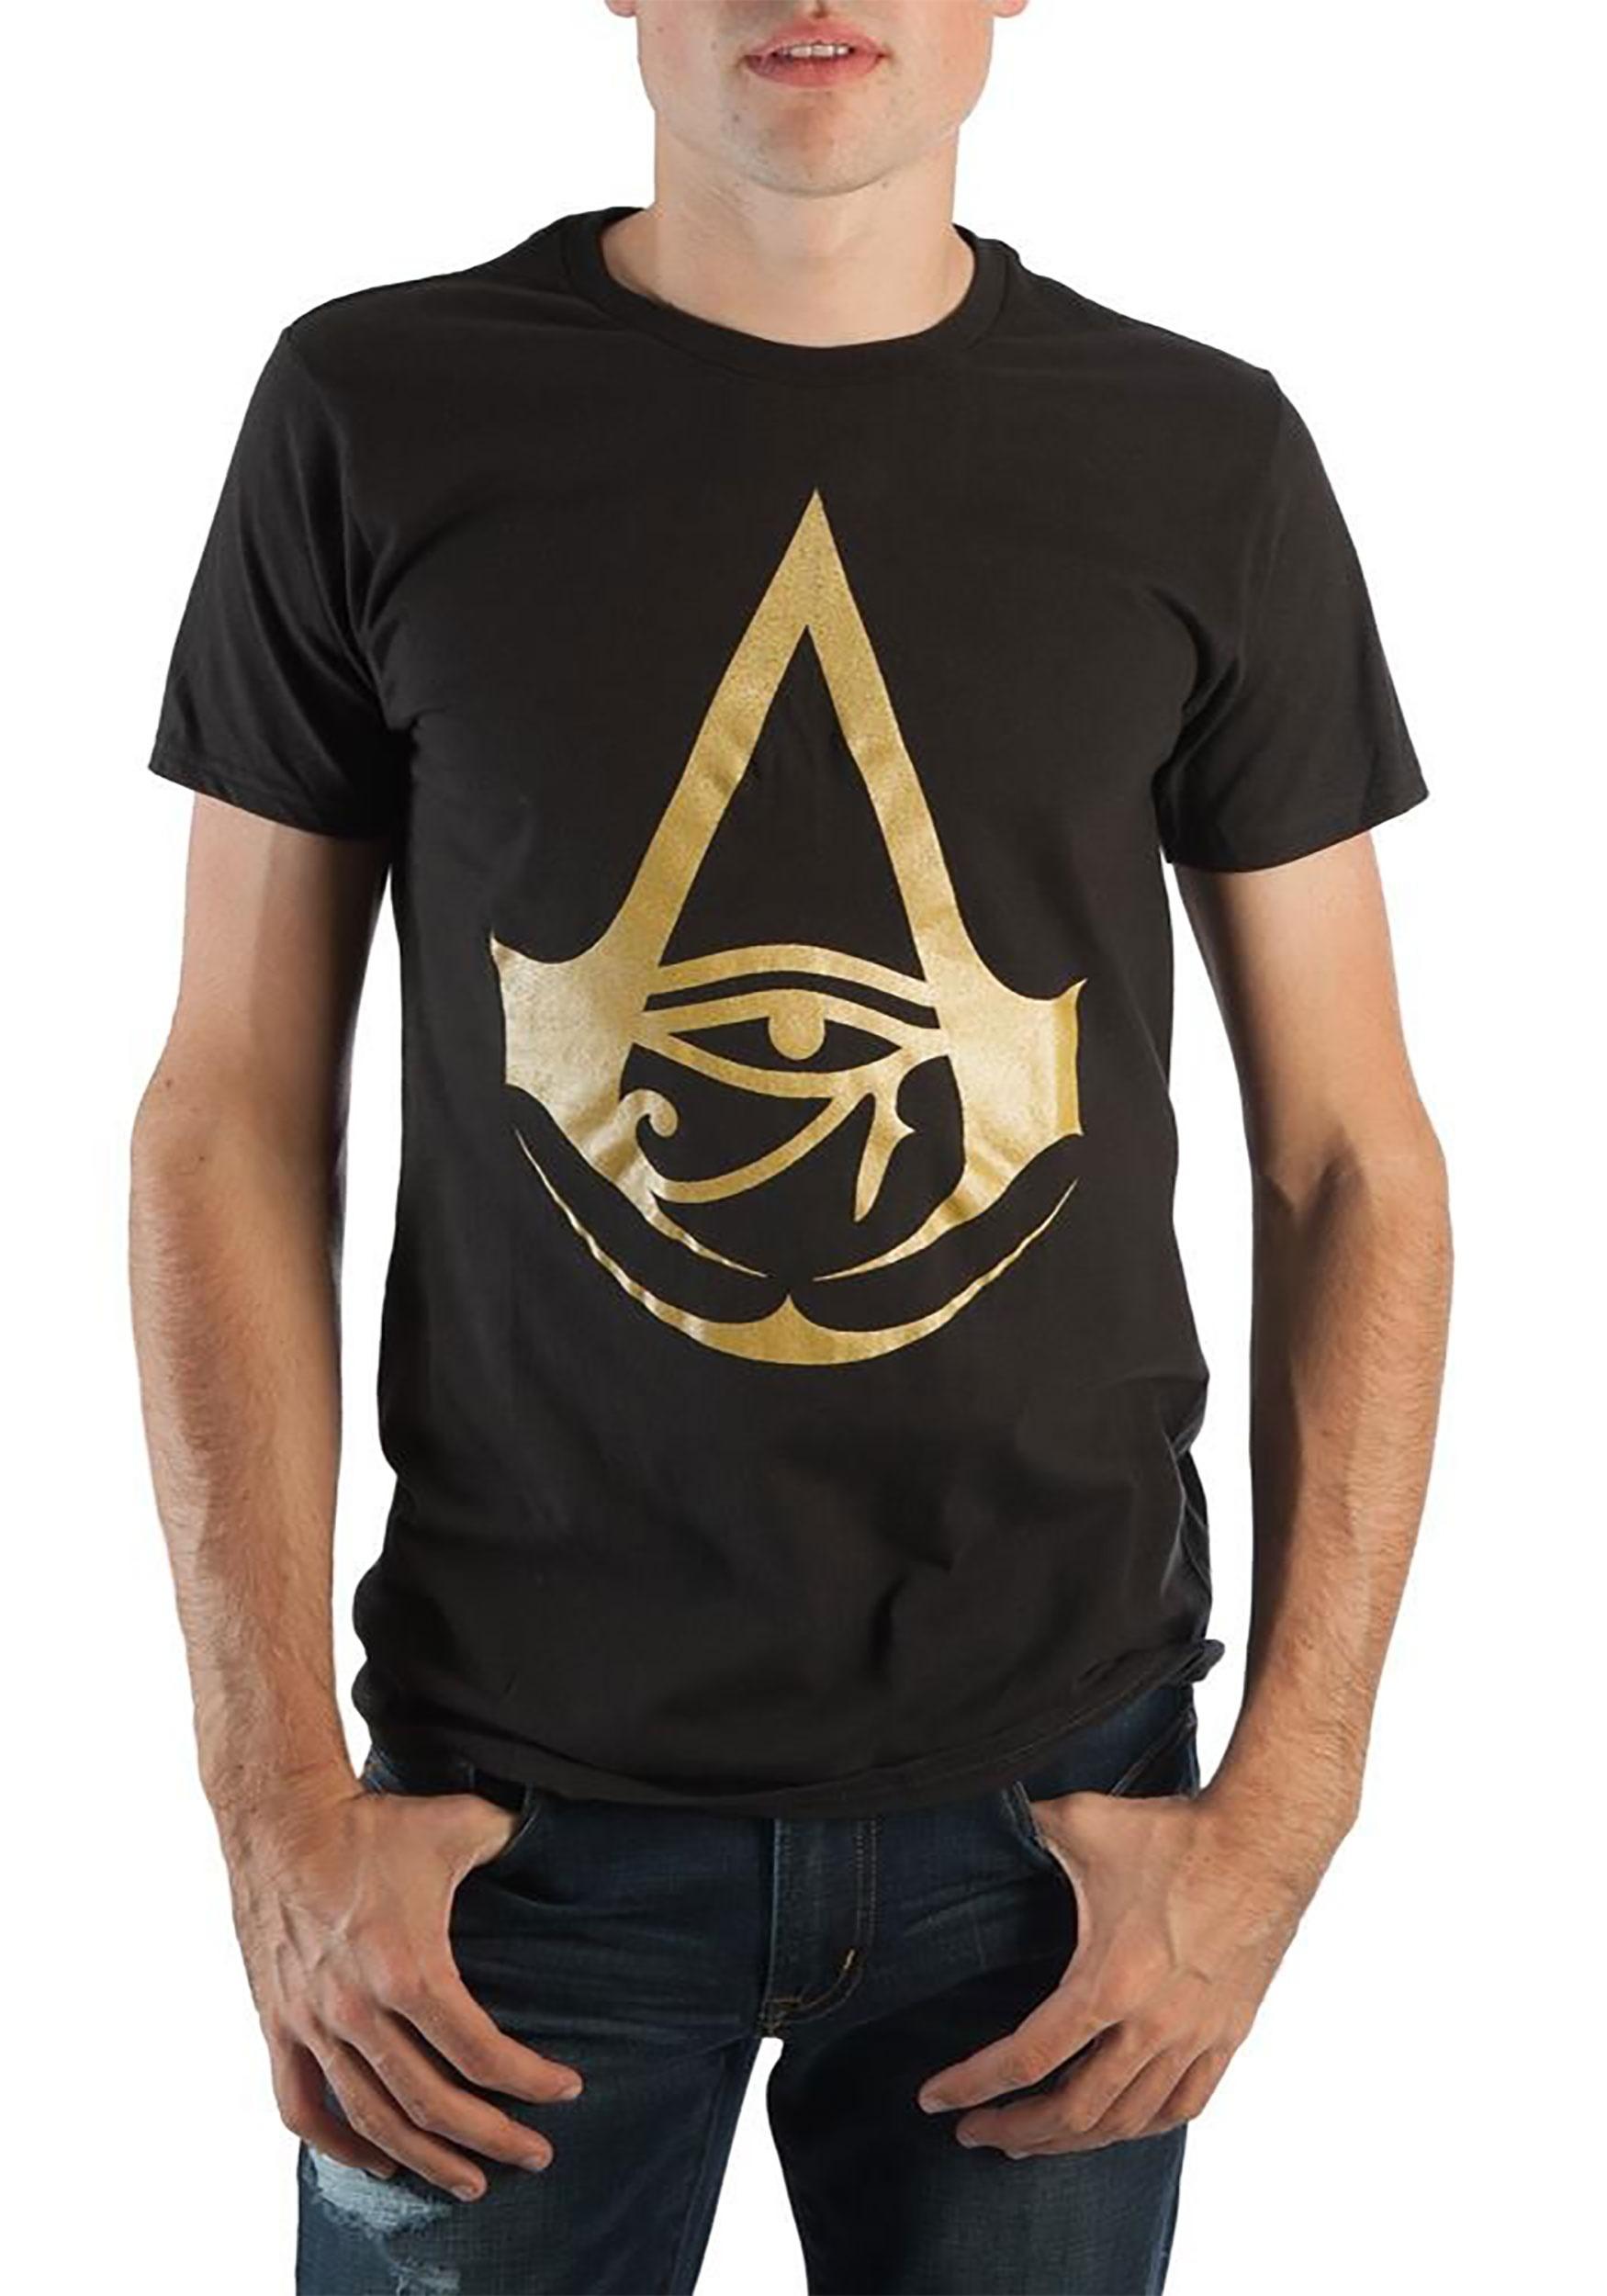 Assassins Creed Origins Foil Logo Black Tee for Men